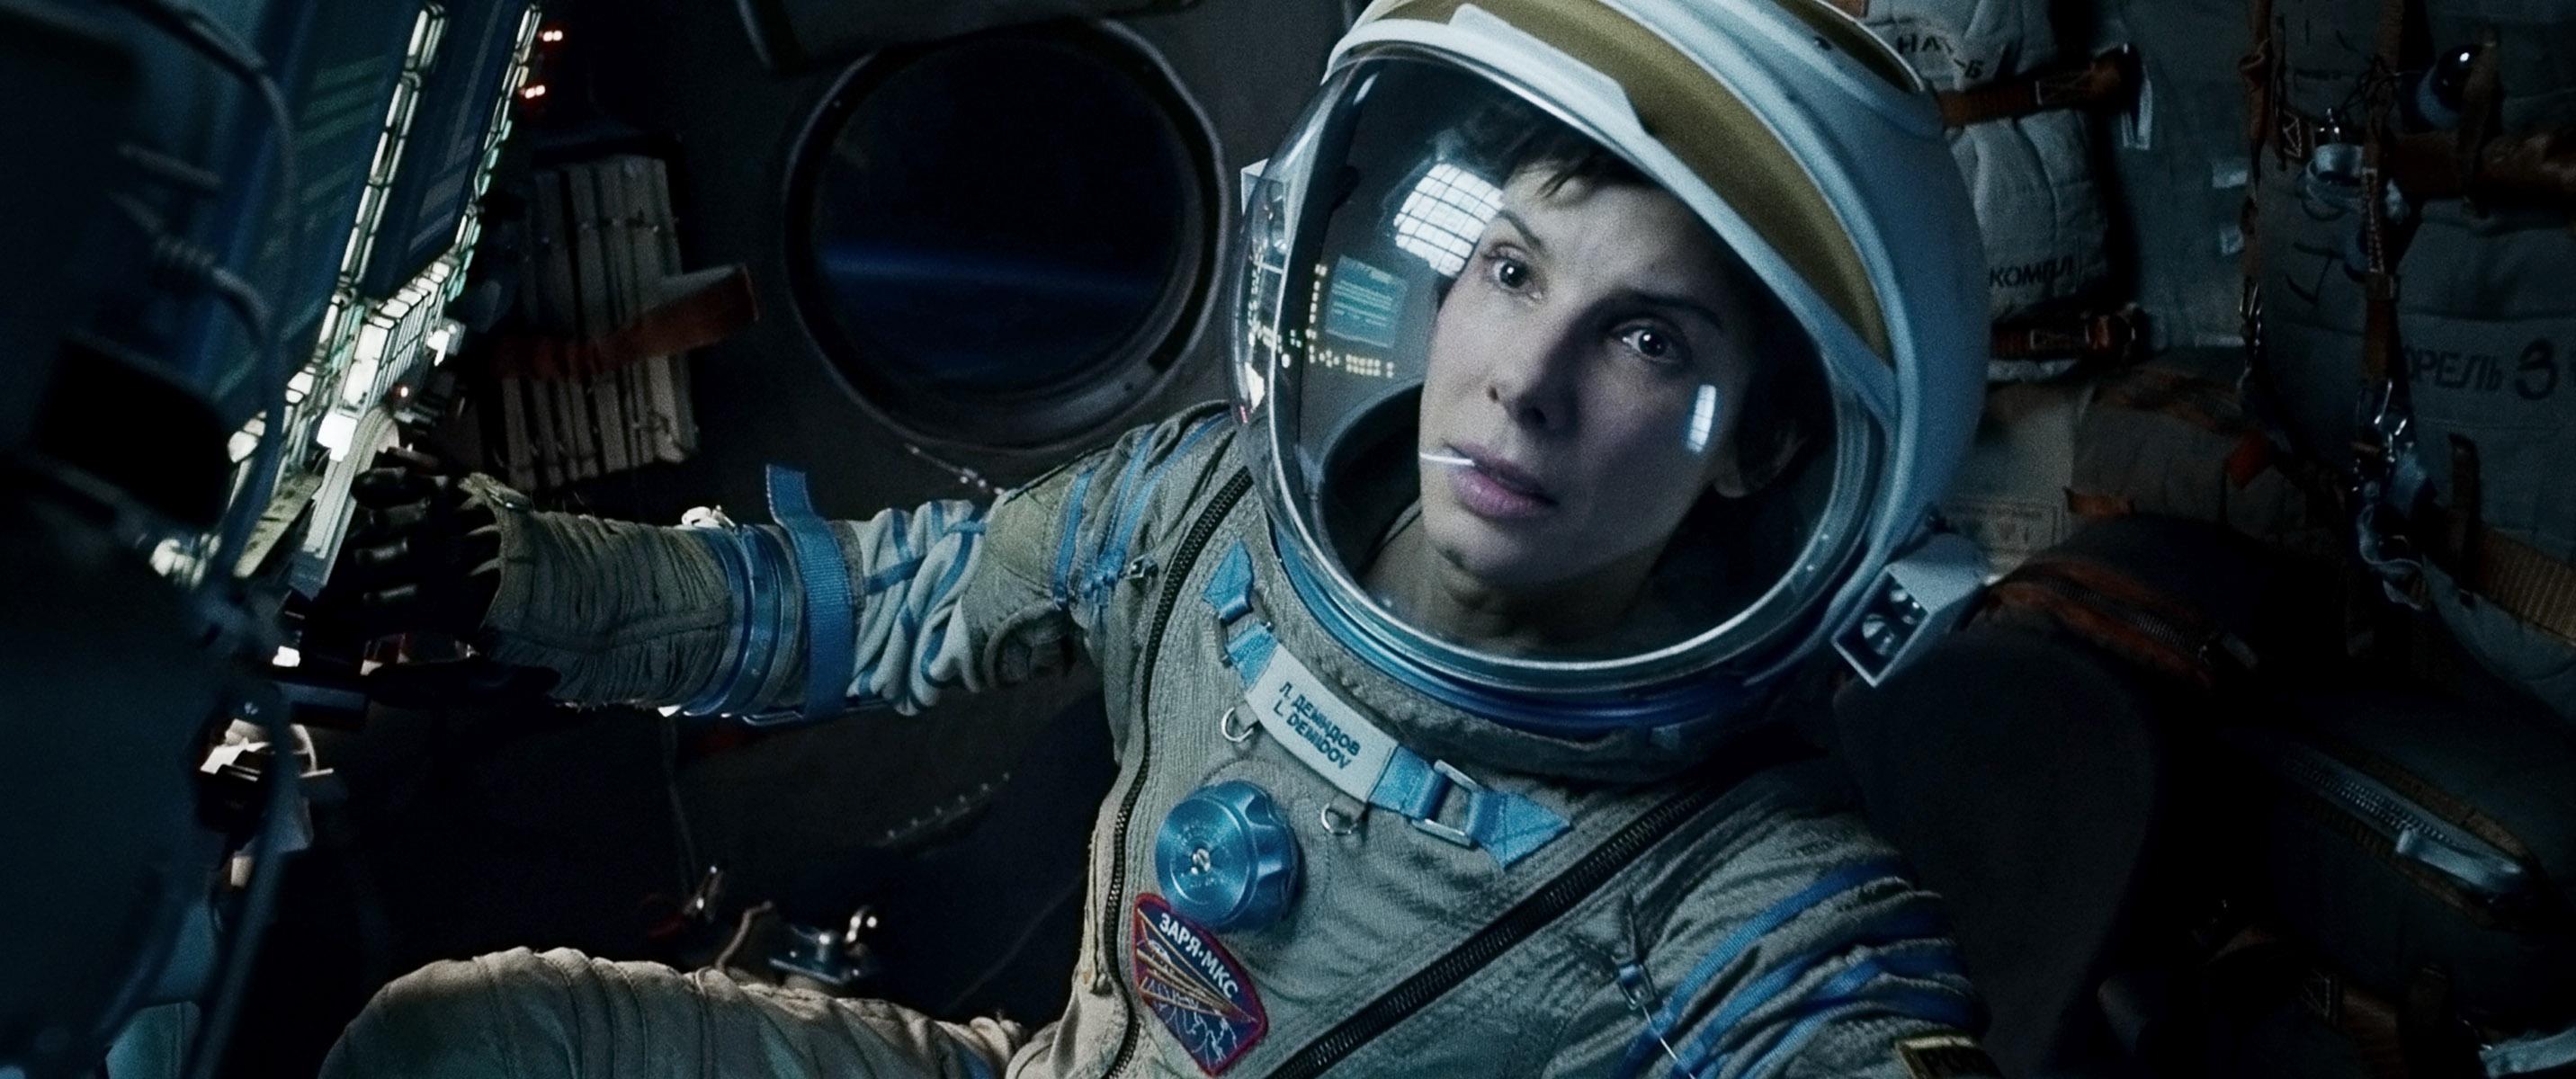 2014: Gravity